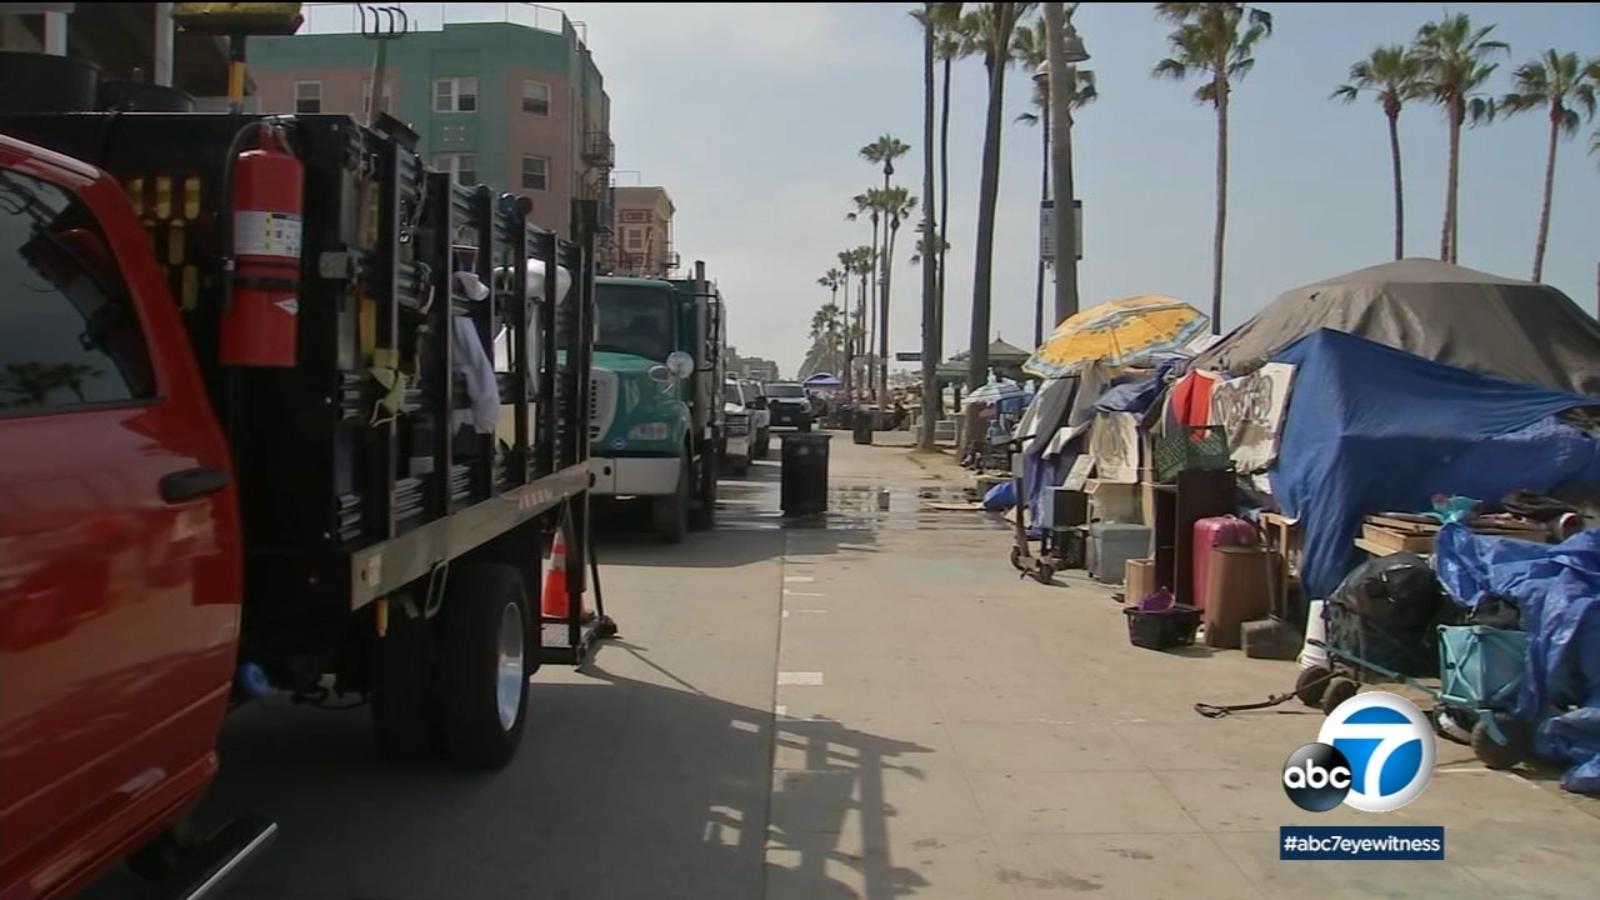 Crews clear out homeless encampments along Venice boardwalk